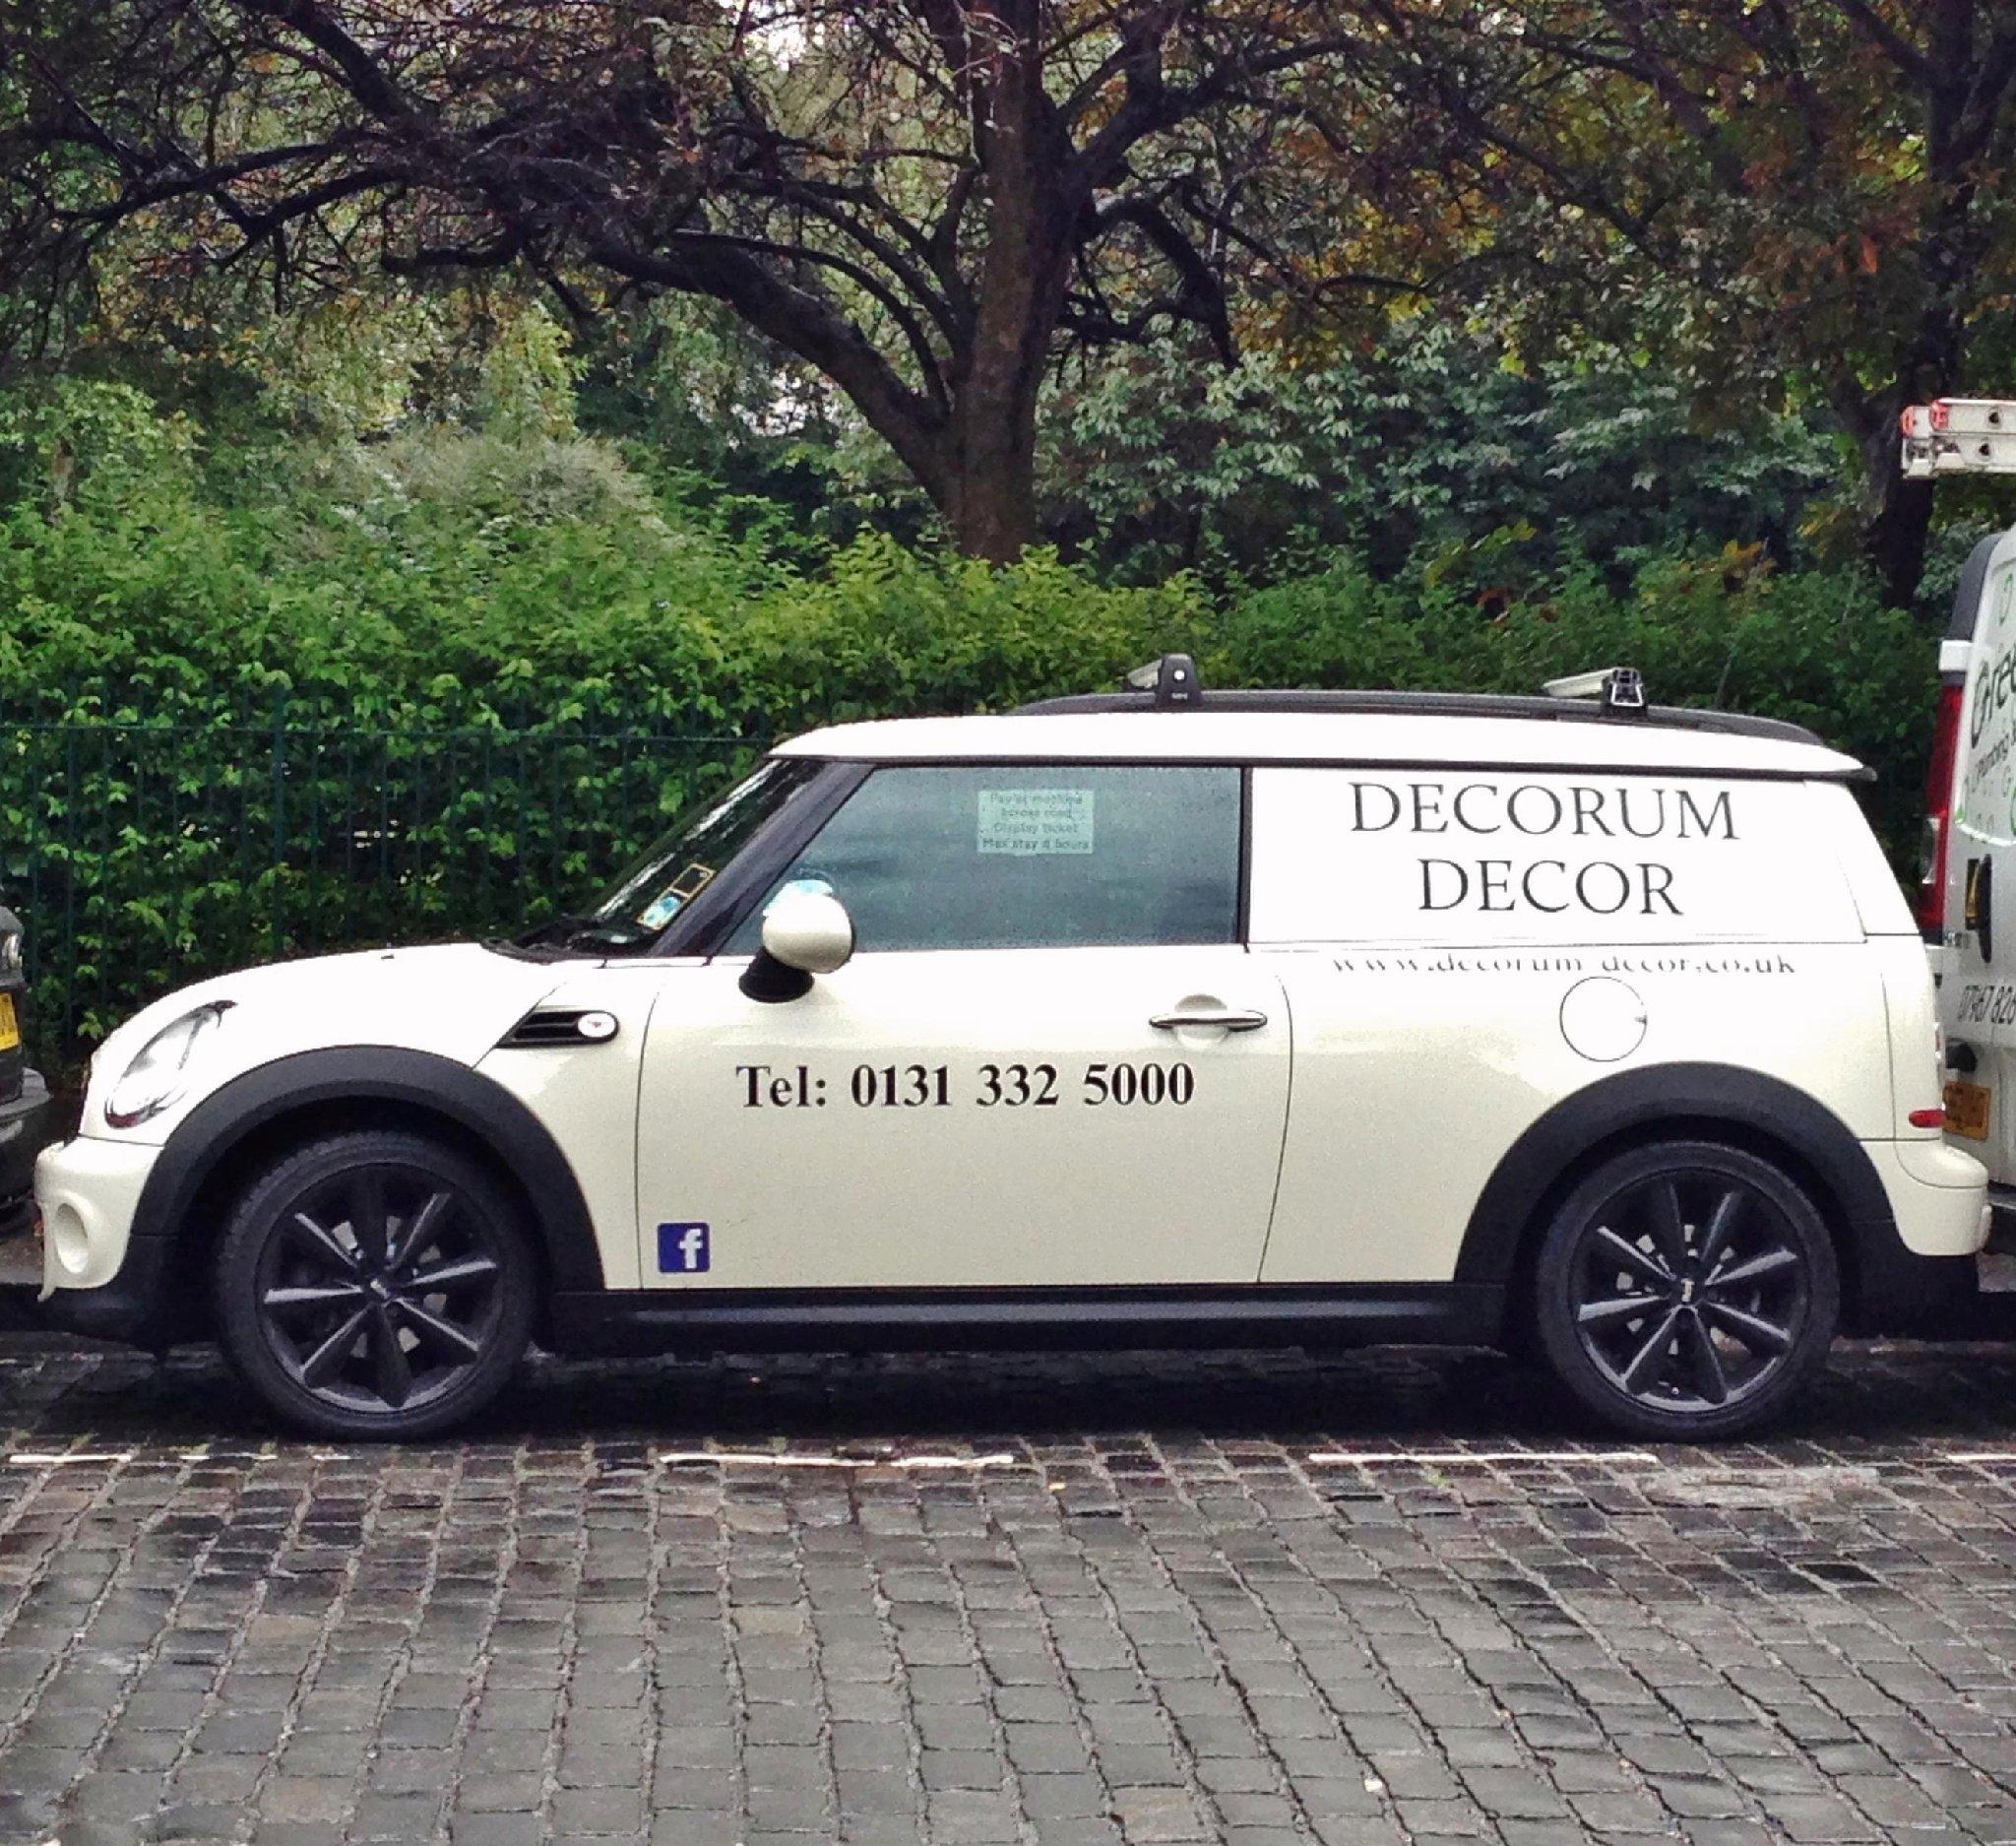 Decorum decor ltd painting and coating companies for Decor and decorum